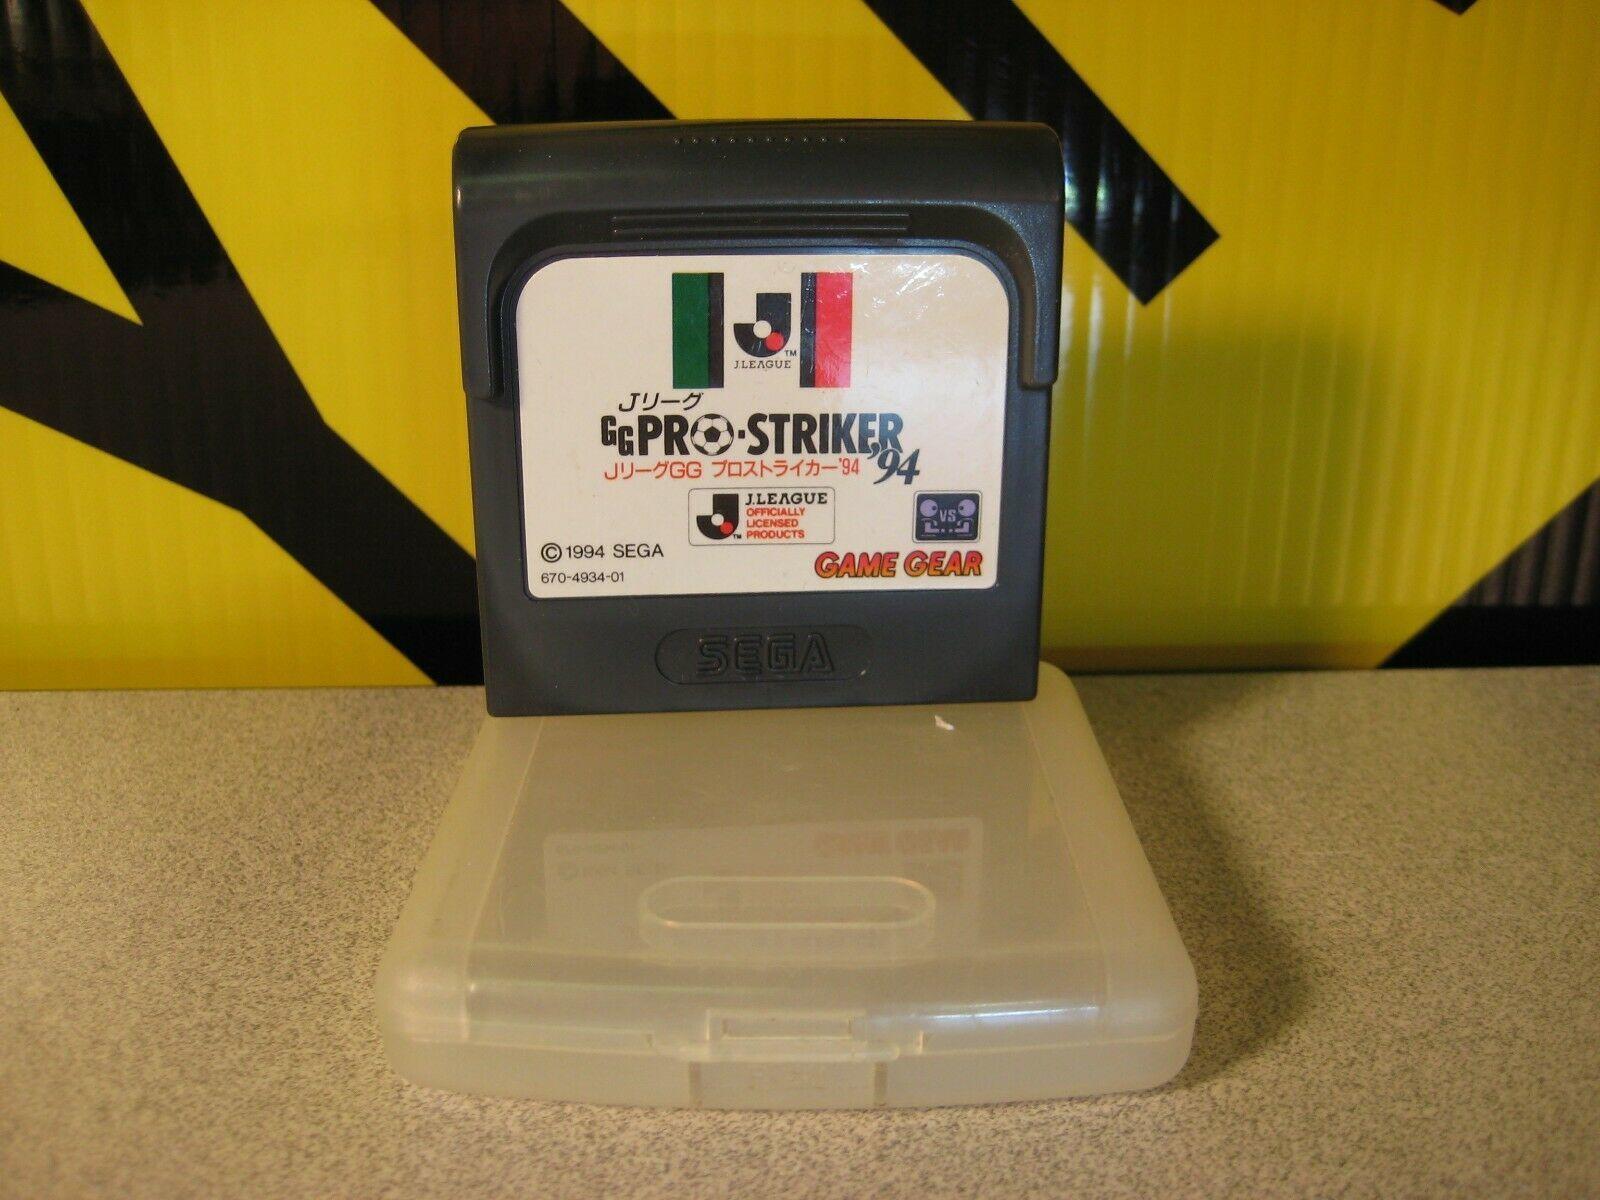 J.League GG Pro Striker 94 Sega Game Gear Cartridge with Case Soccer Football